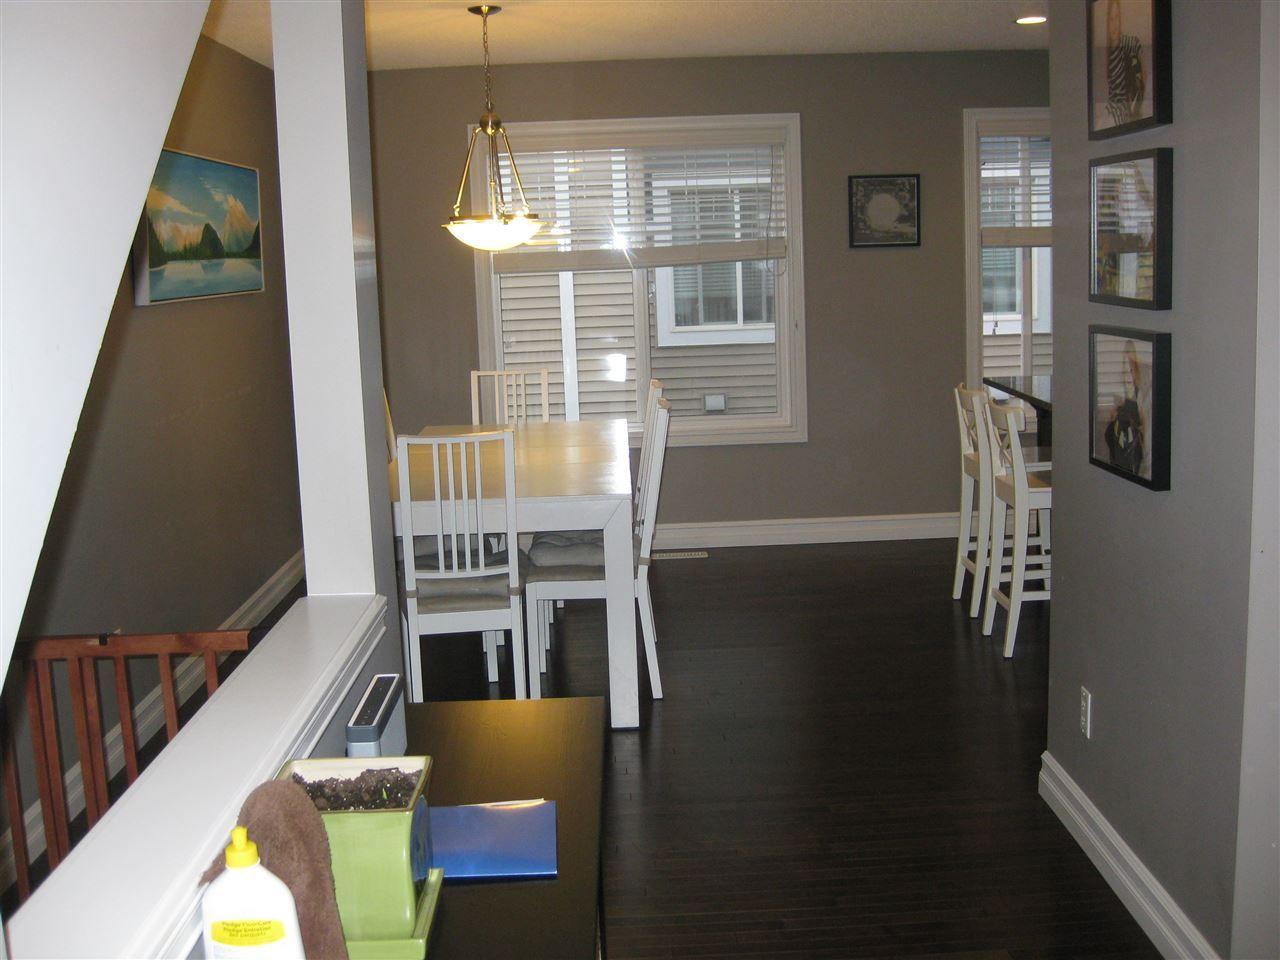 Photo 5: Photos: #41 3625 144 AV NW in Edmonton: Zone 35 Townhouse for sale : MLS®# E4016087